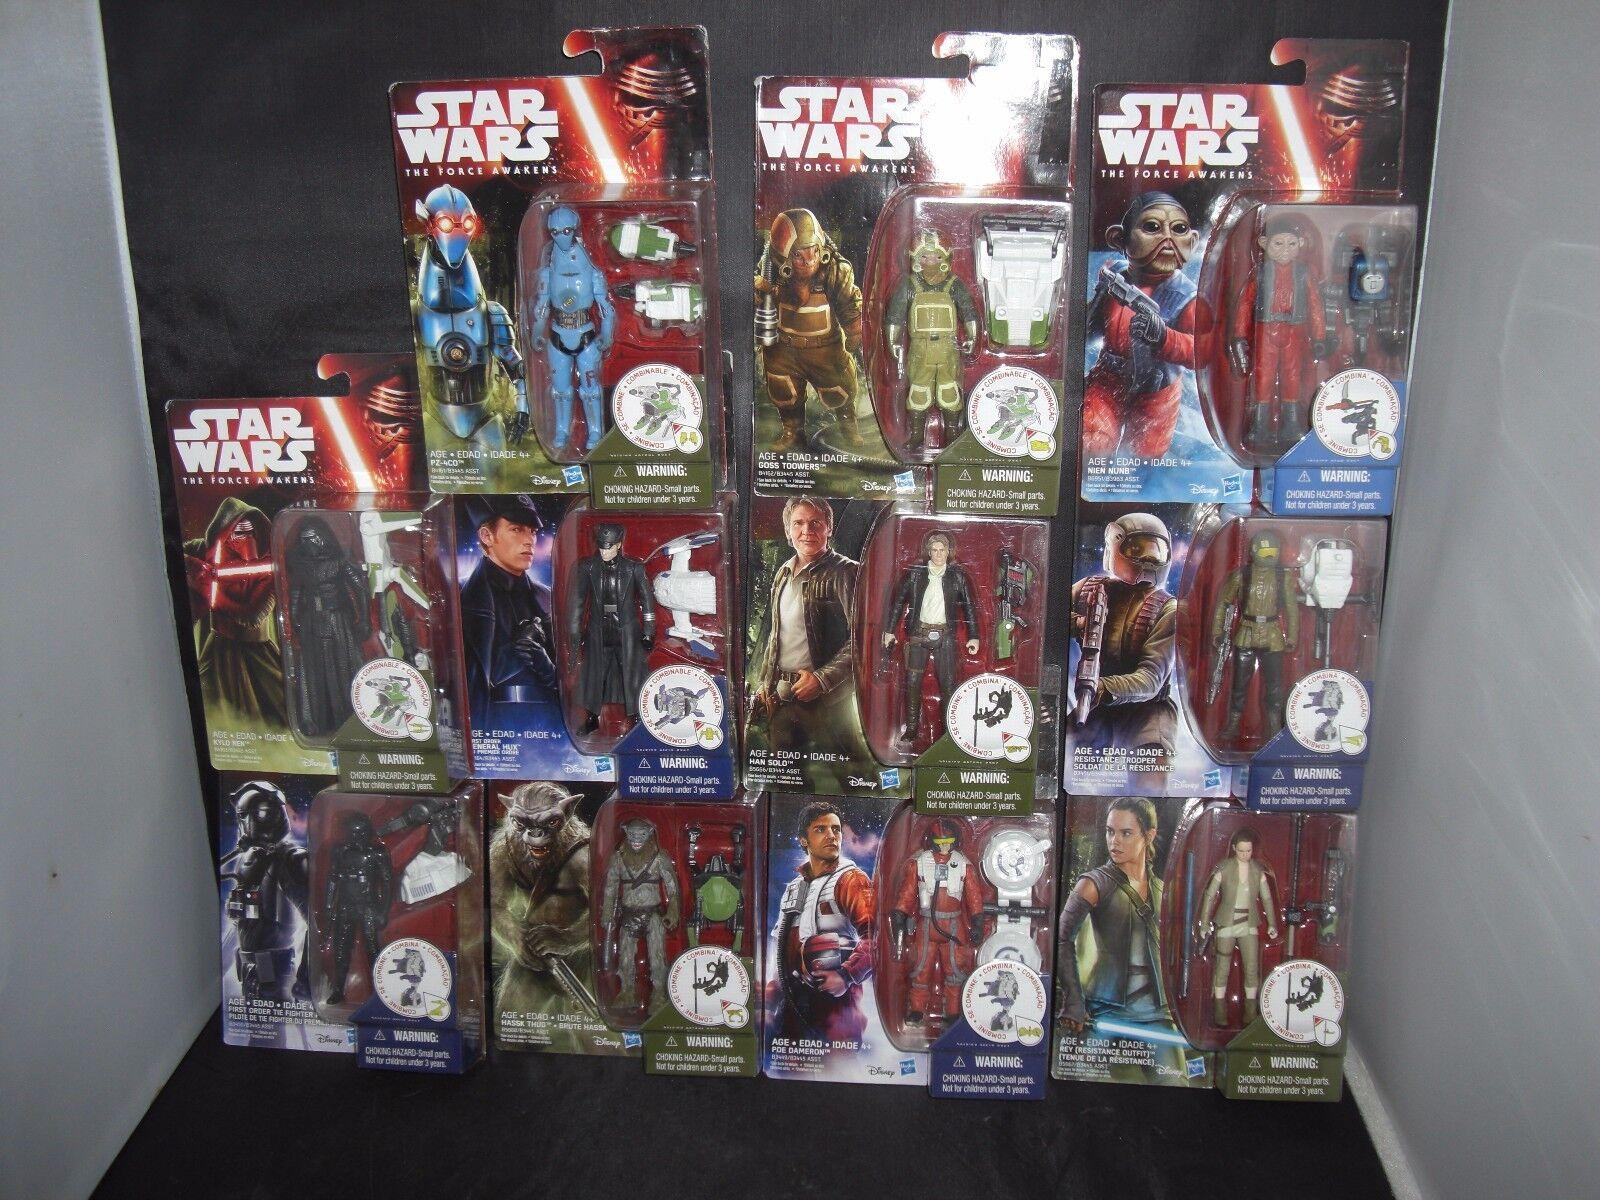 Star Wars Force Awakens 3.75  PZ-4CO,HanSolo,KyloRen,NienNunb,Dameron,HasskThug